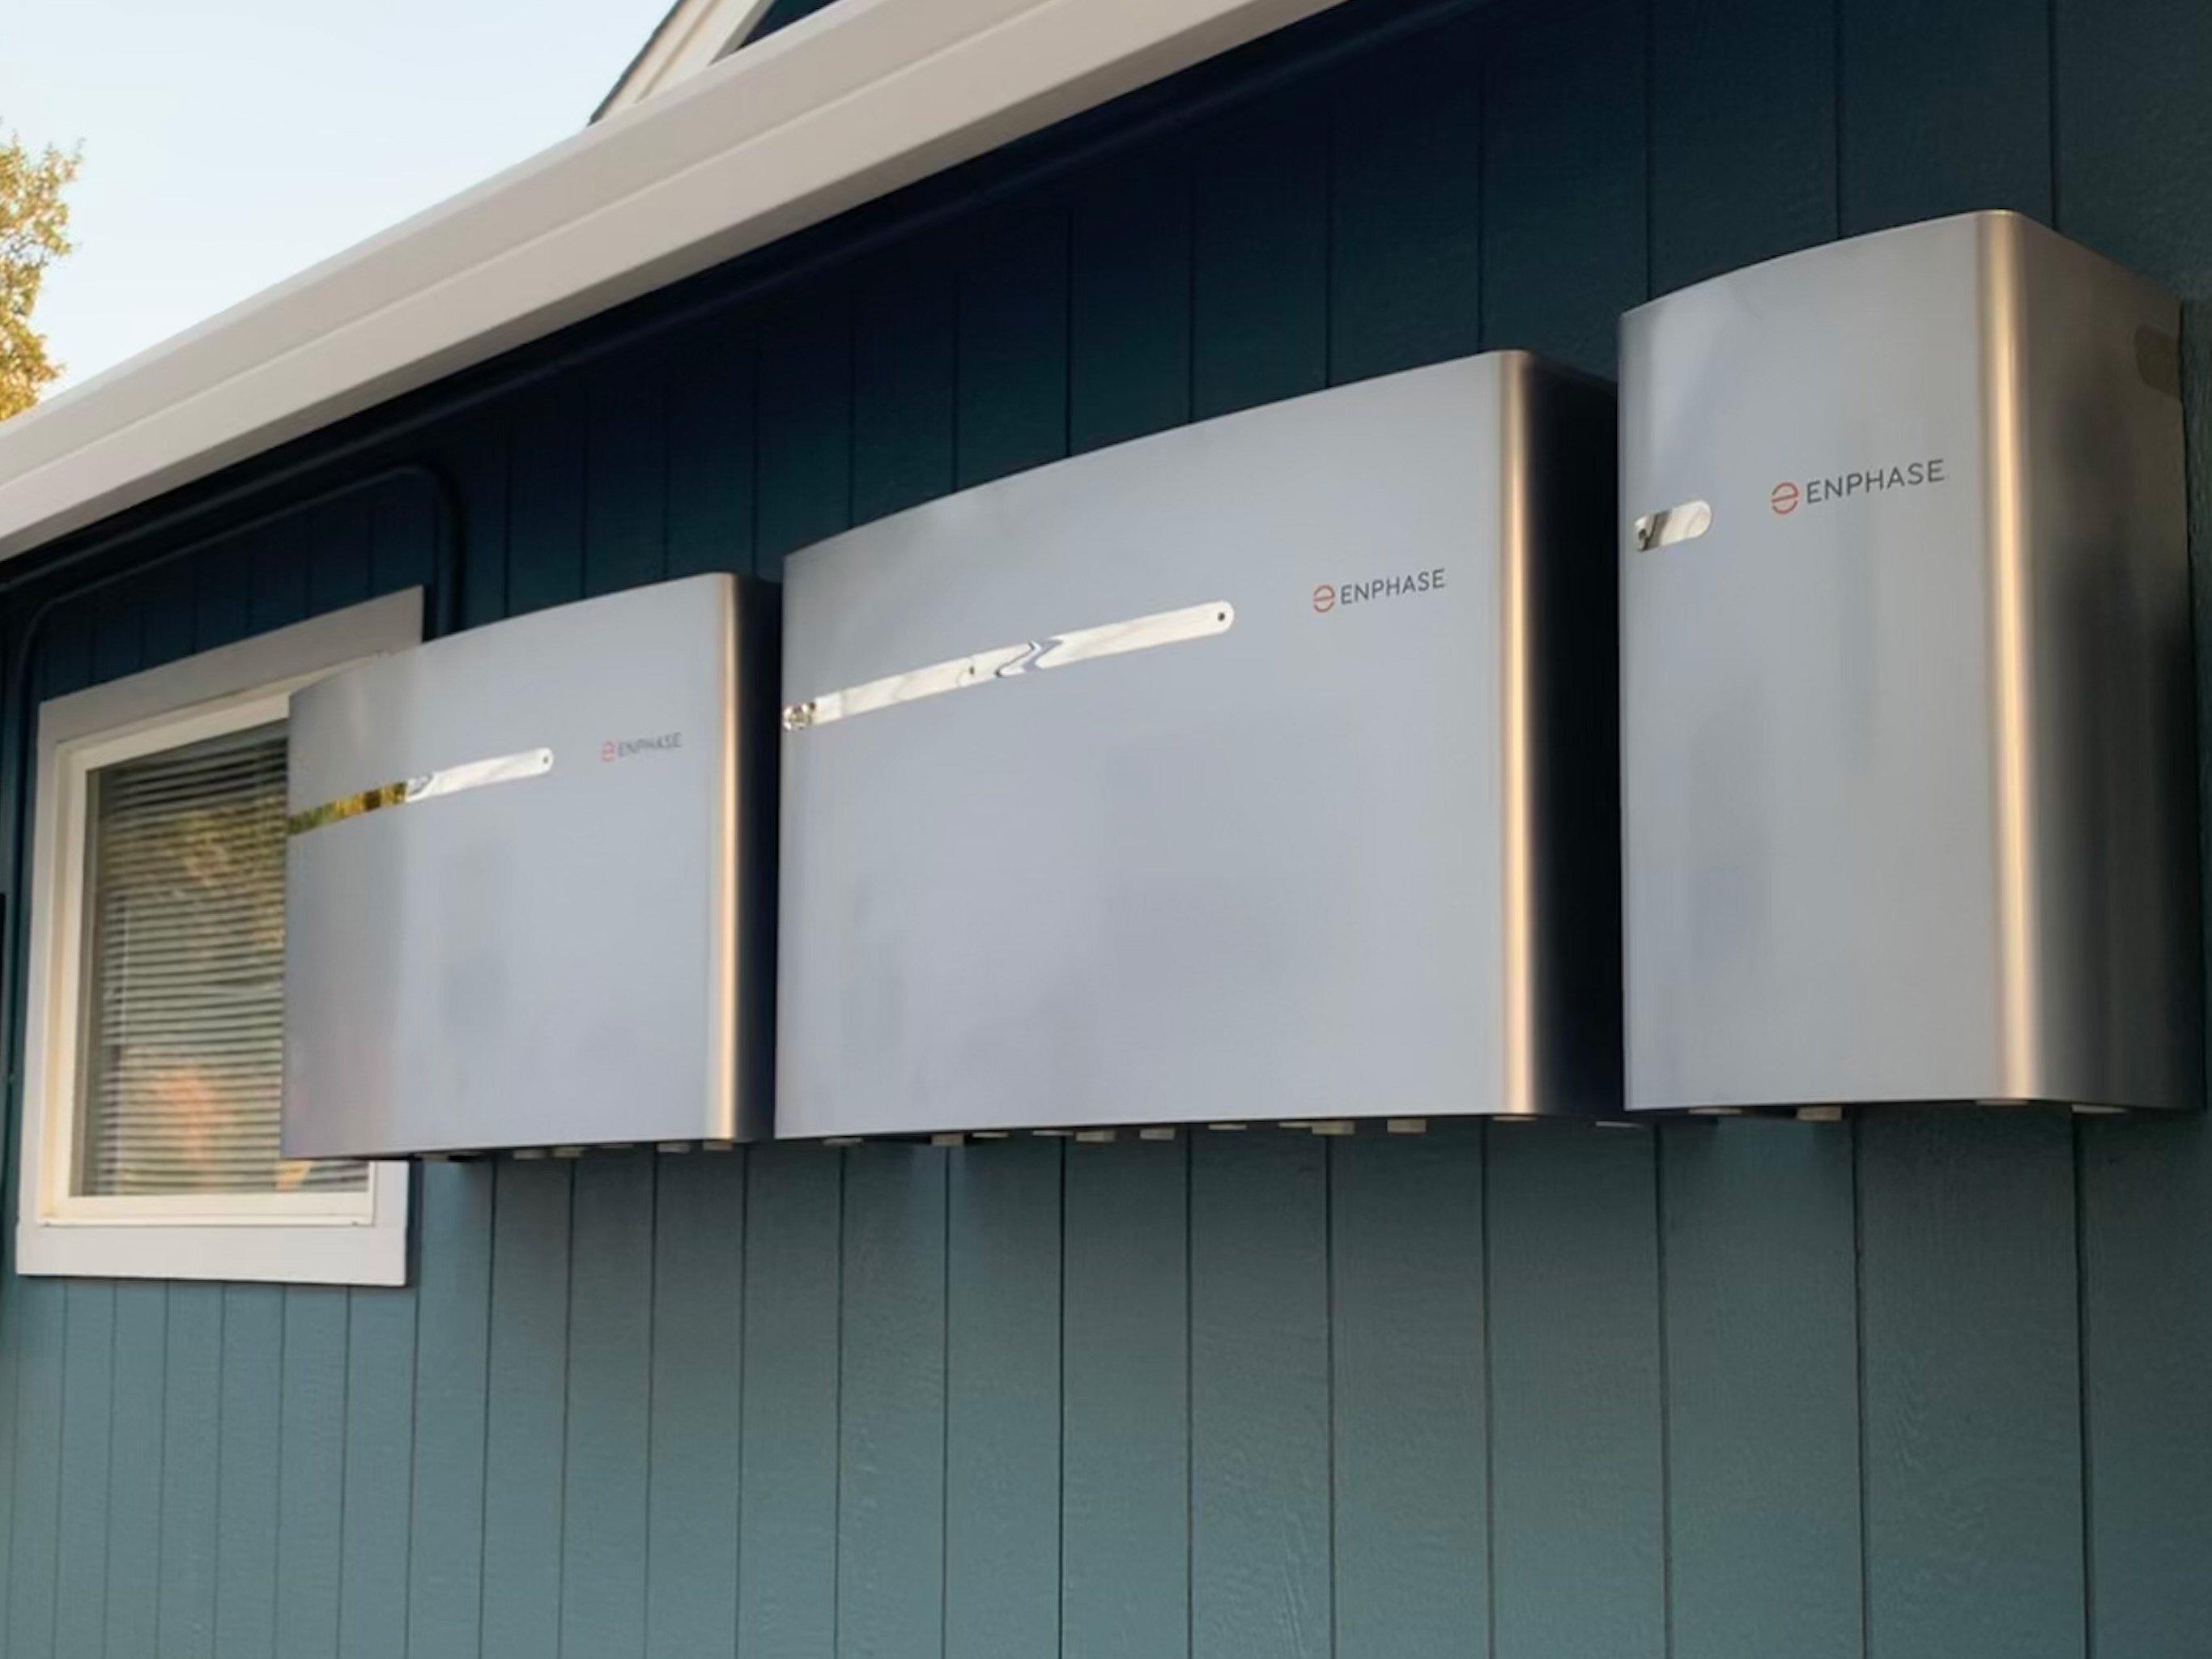 Enphase Residential Storage